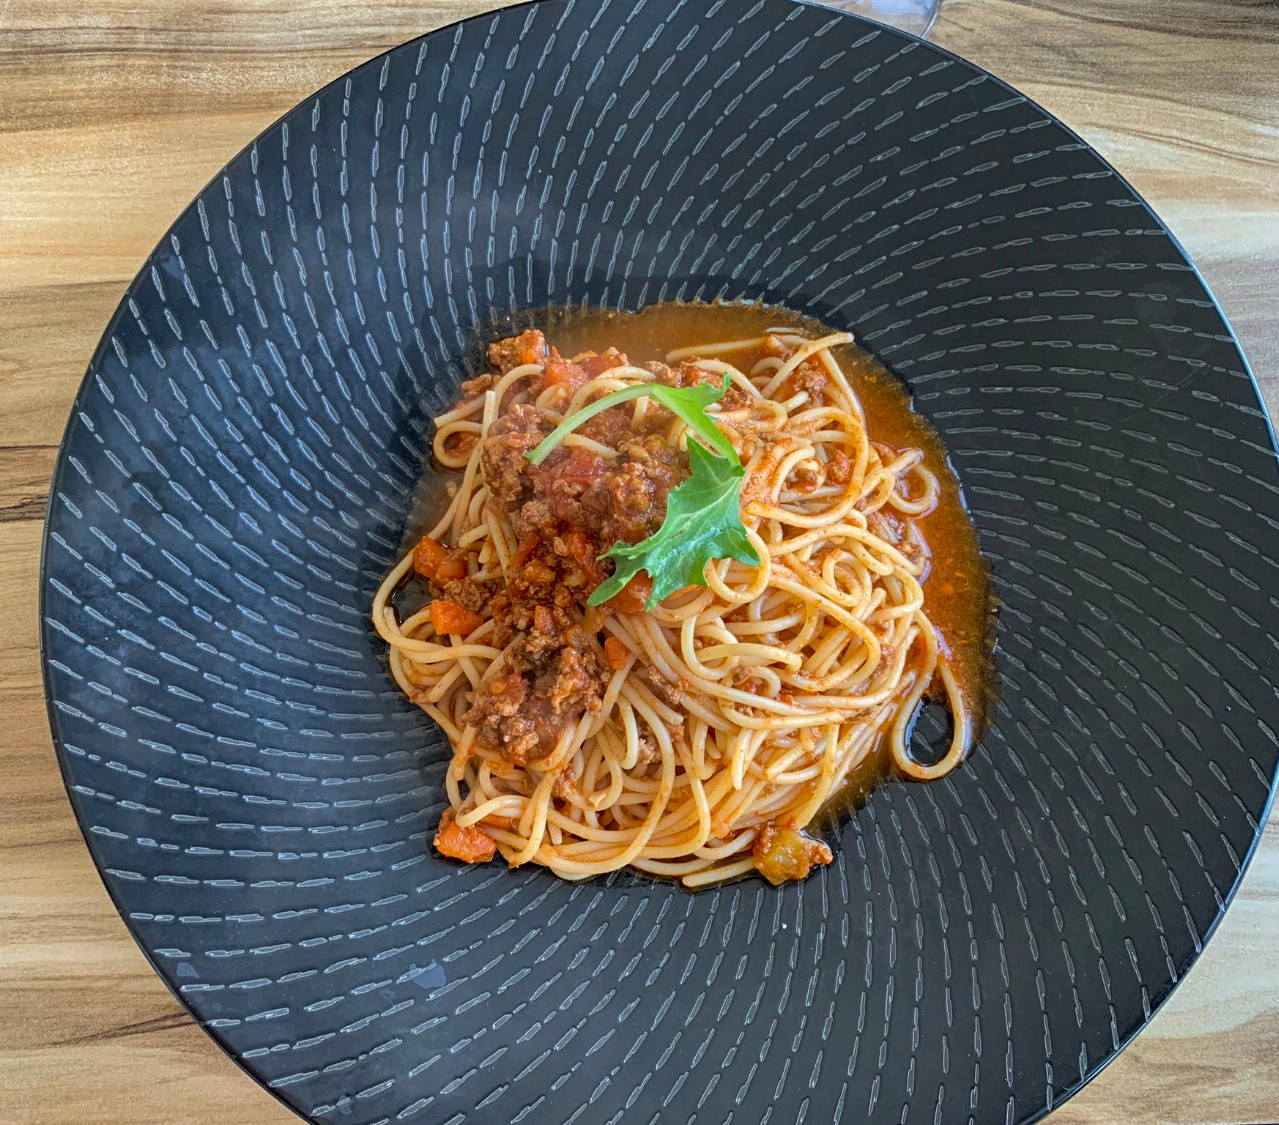 Food by Bondi Beach